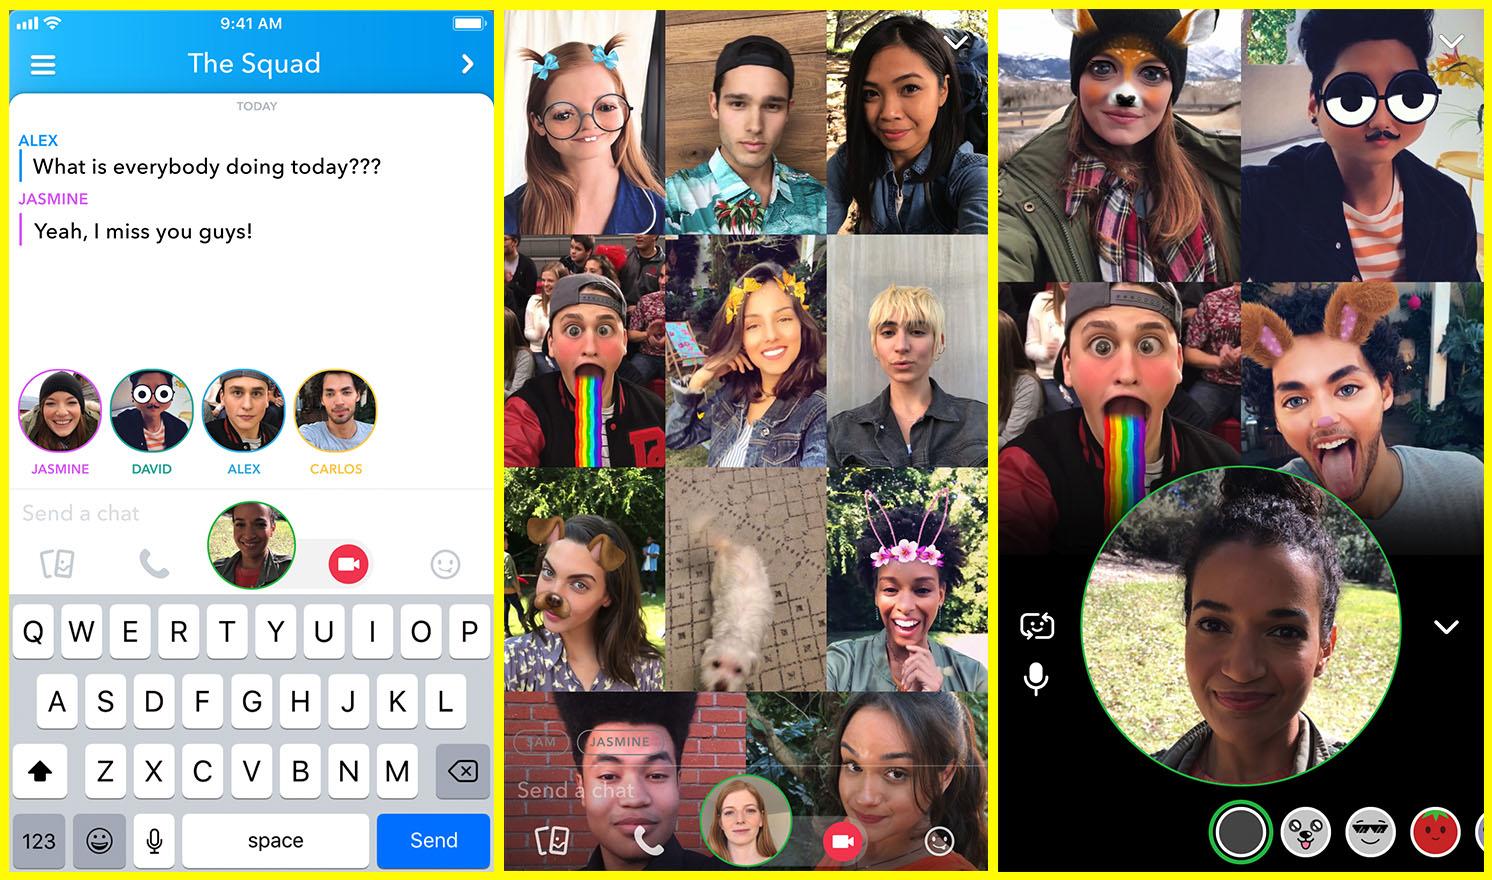 Three screenshots of group calling interface in Snapchat